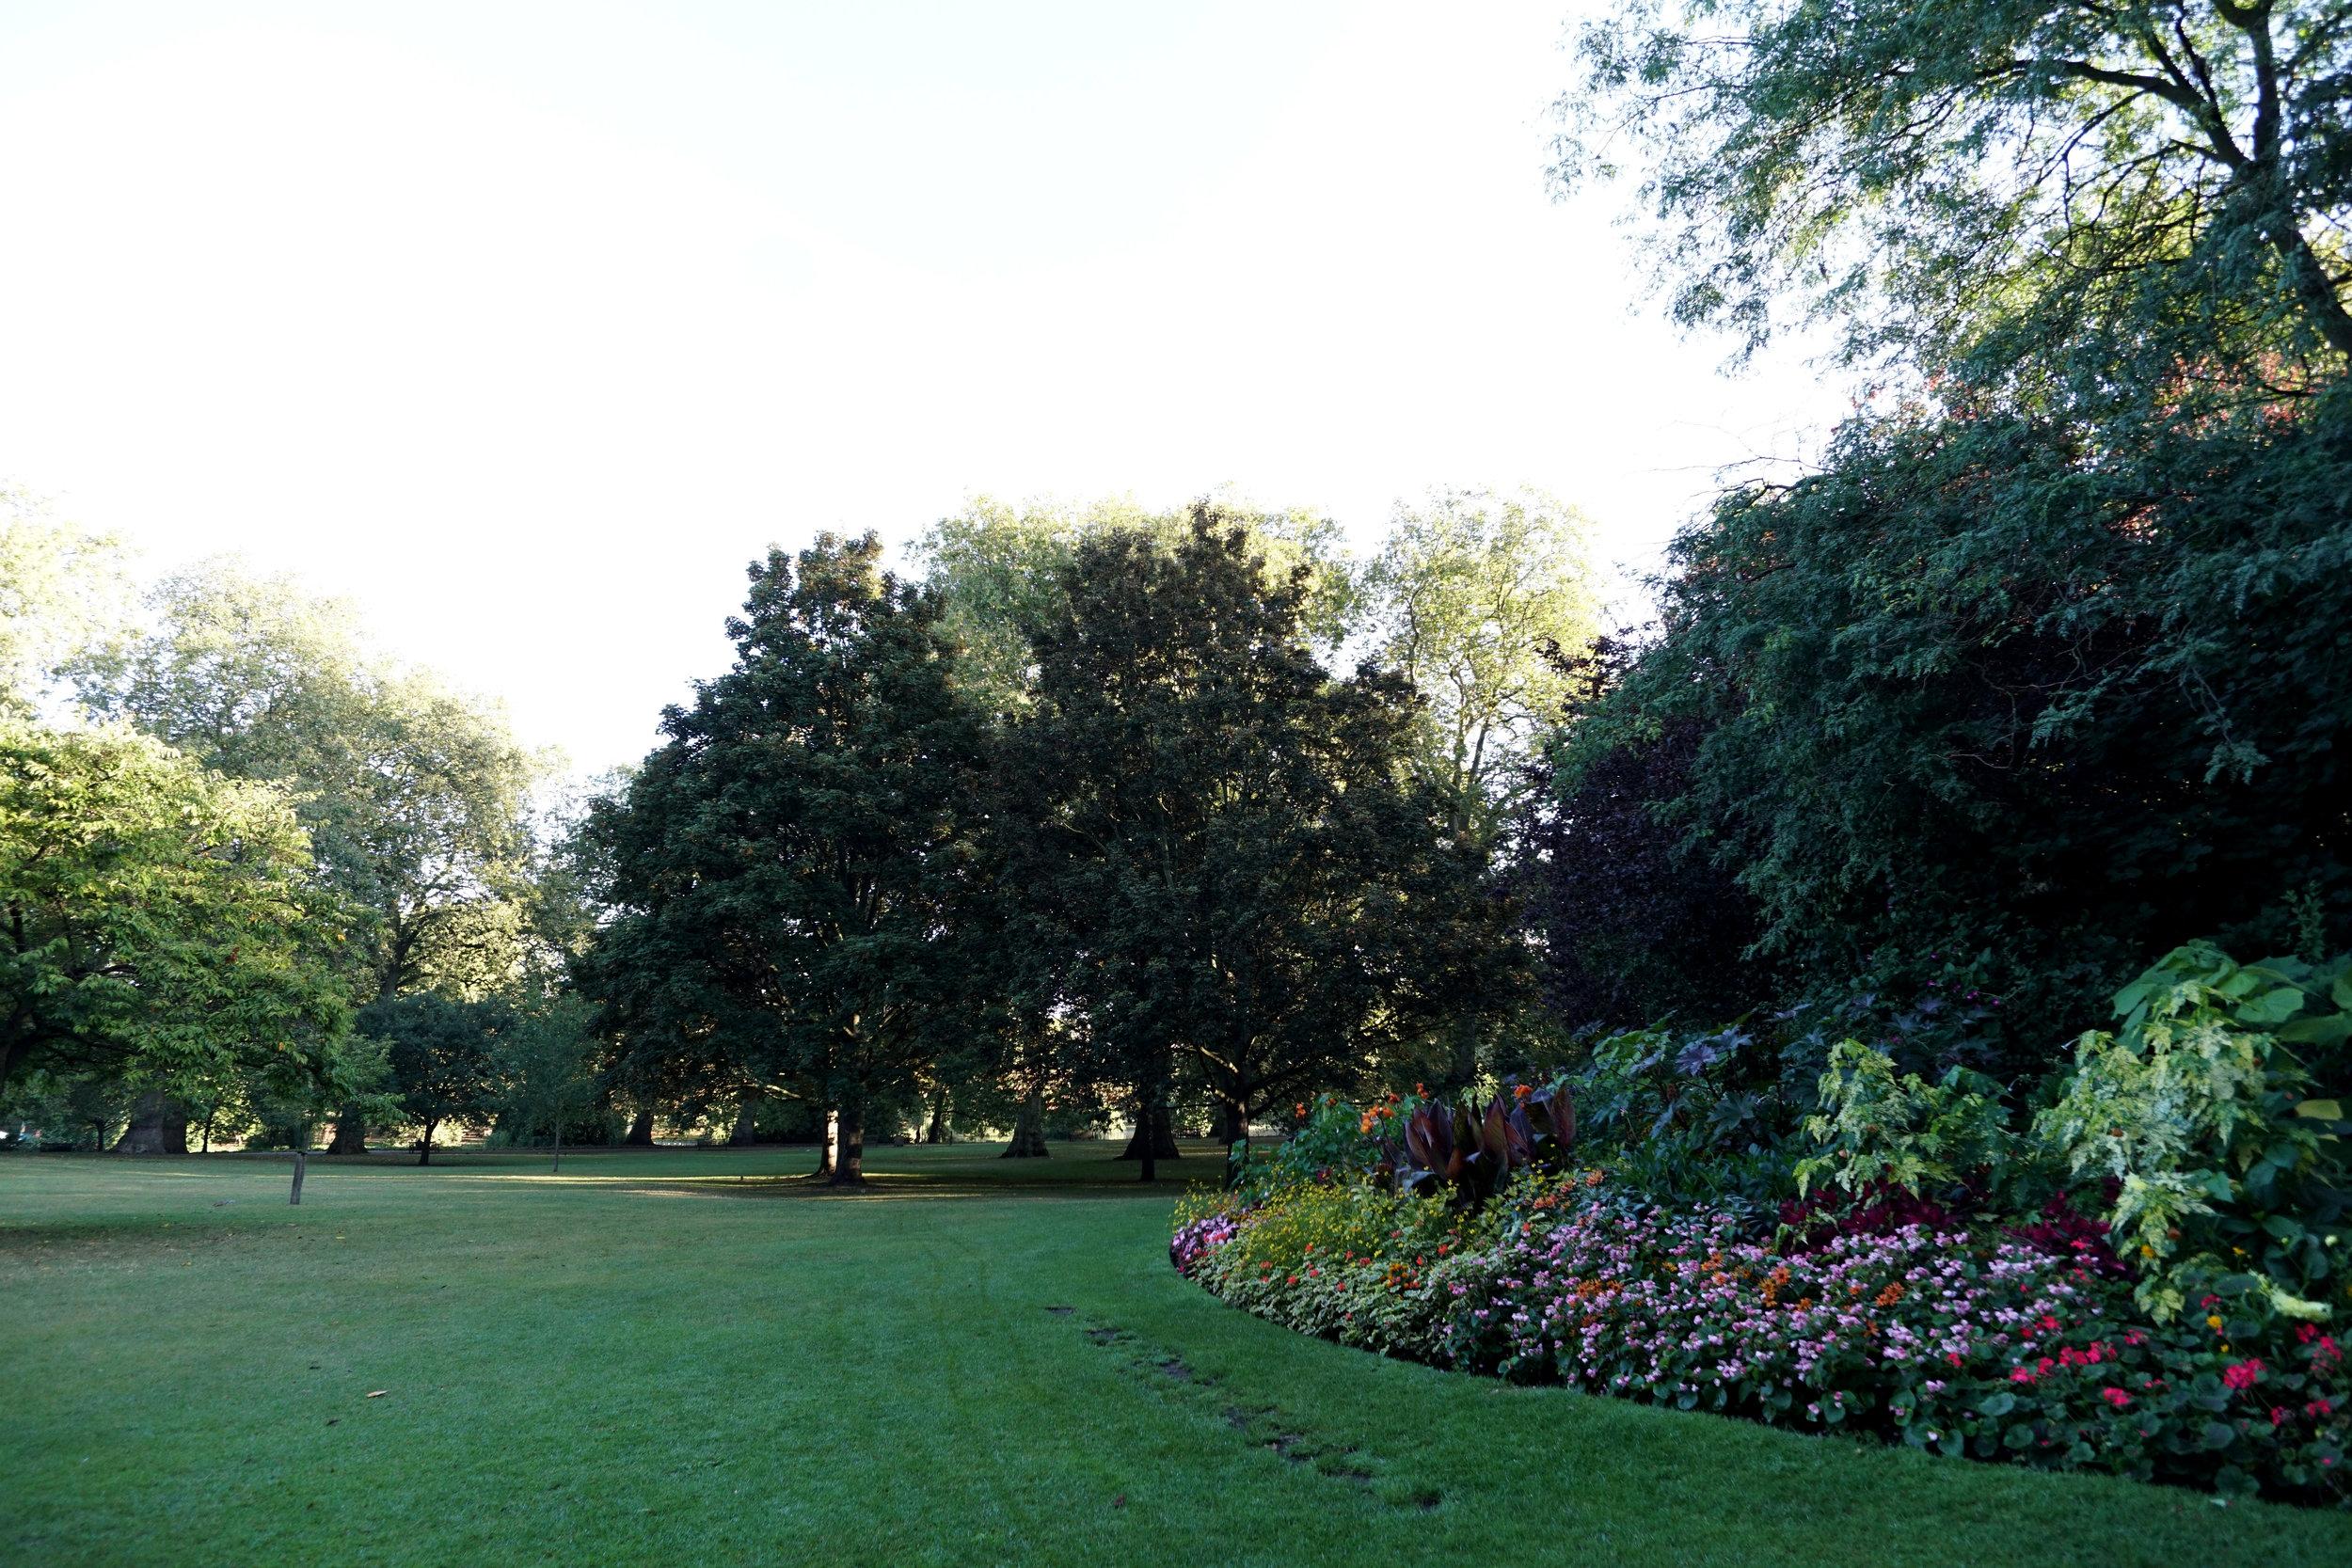 Stroll through the park